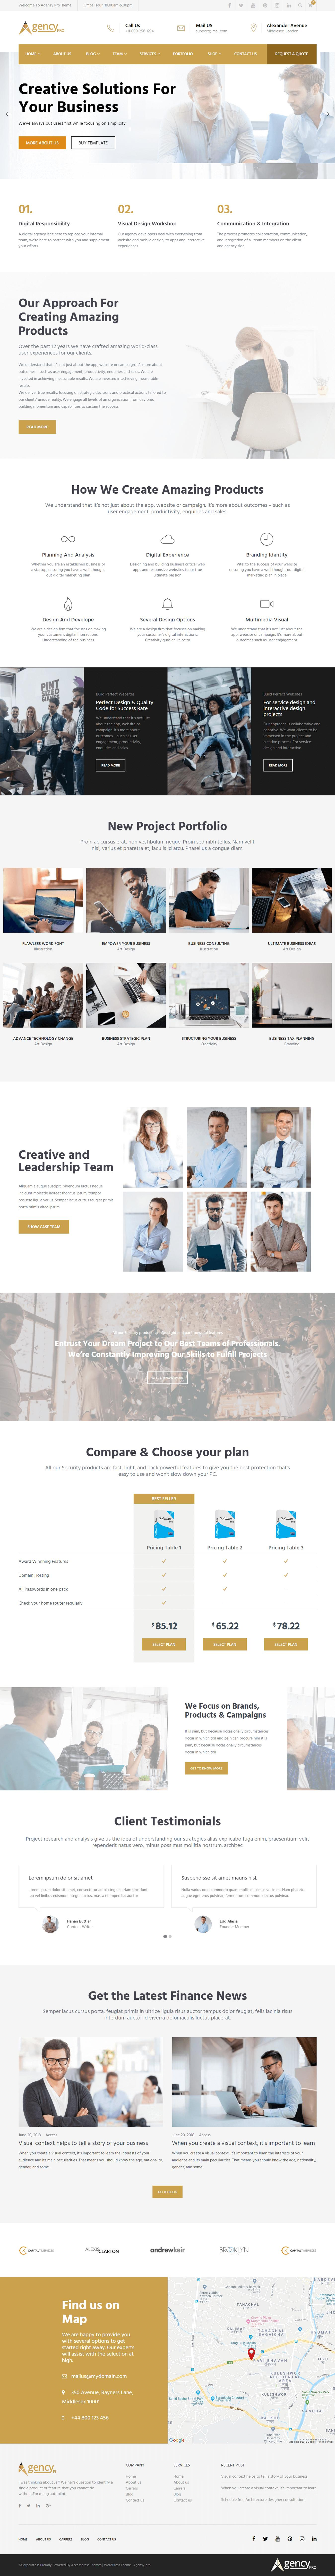 Agency Pro - Mejor tema premium multipropósito de WordPress